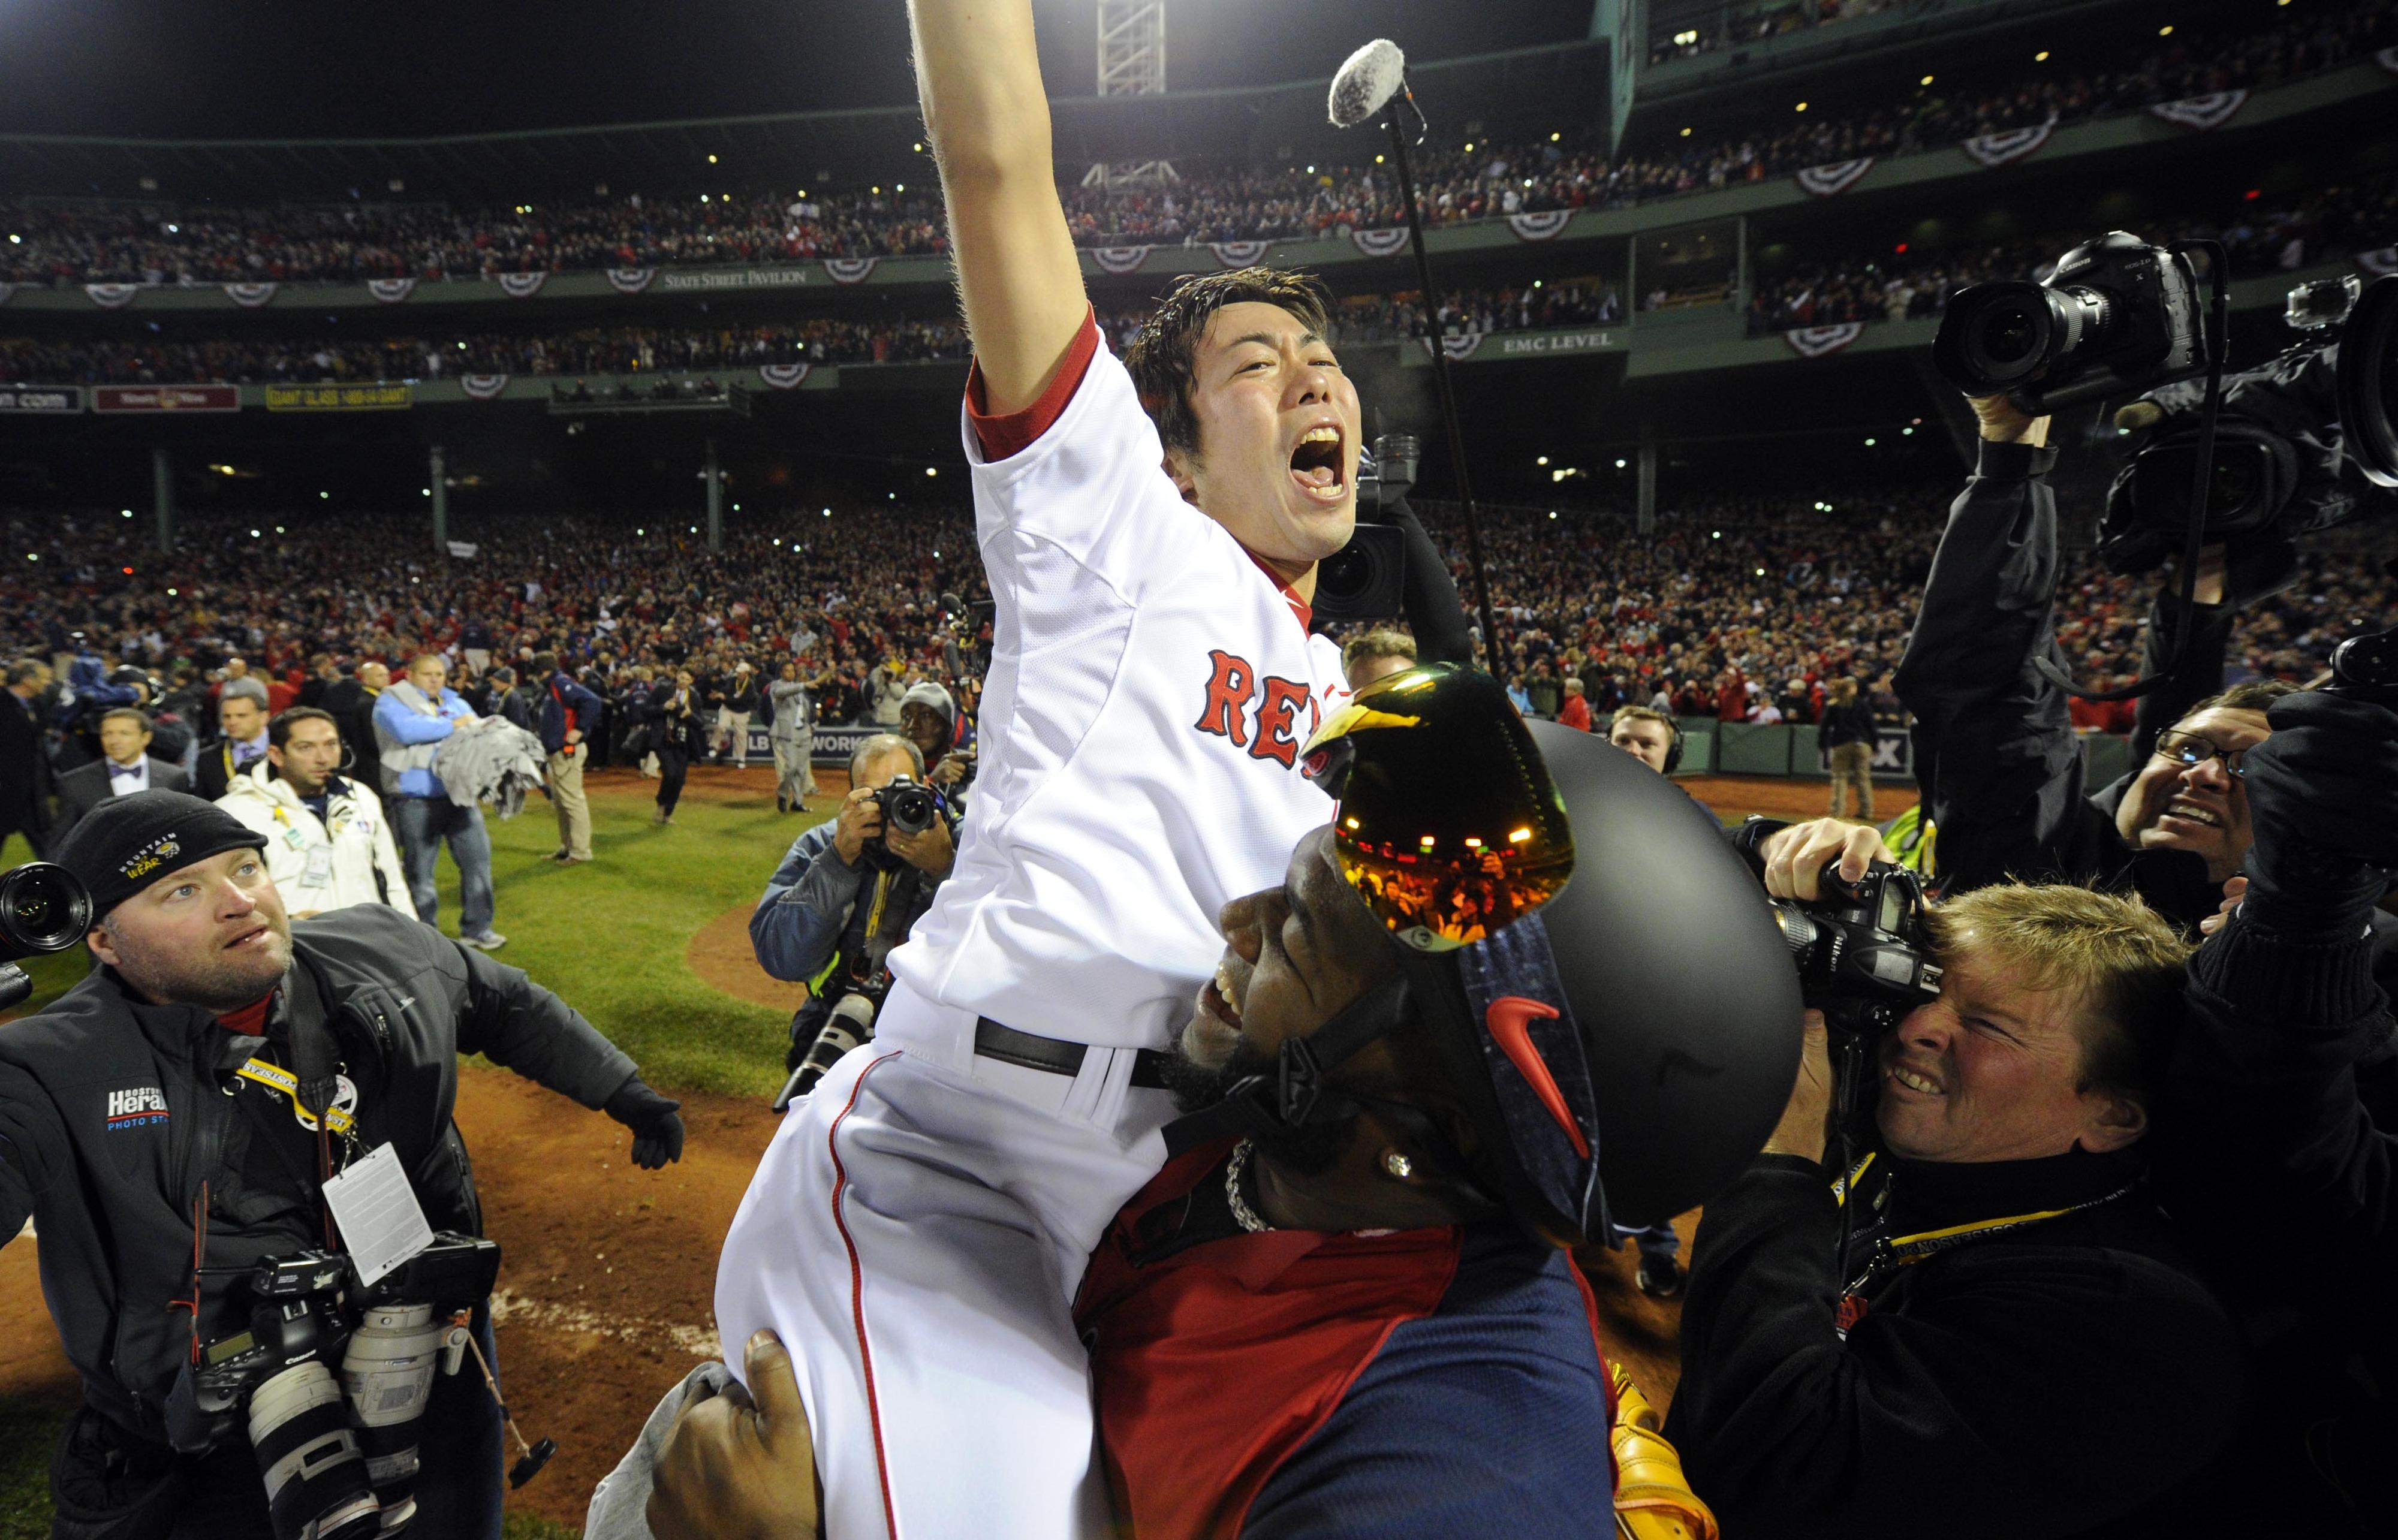 The always-enthusiastic Koji Uehara had a lot to celebrate in 2013.